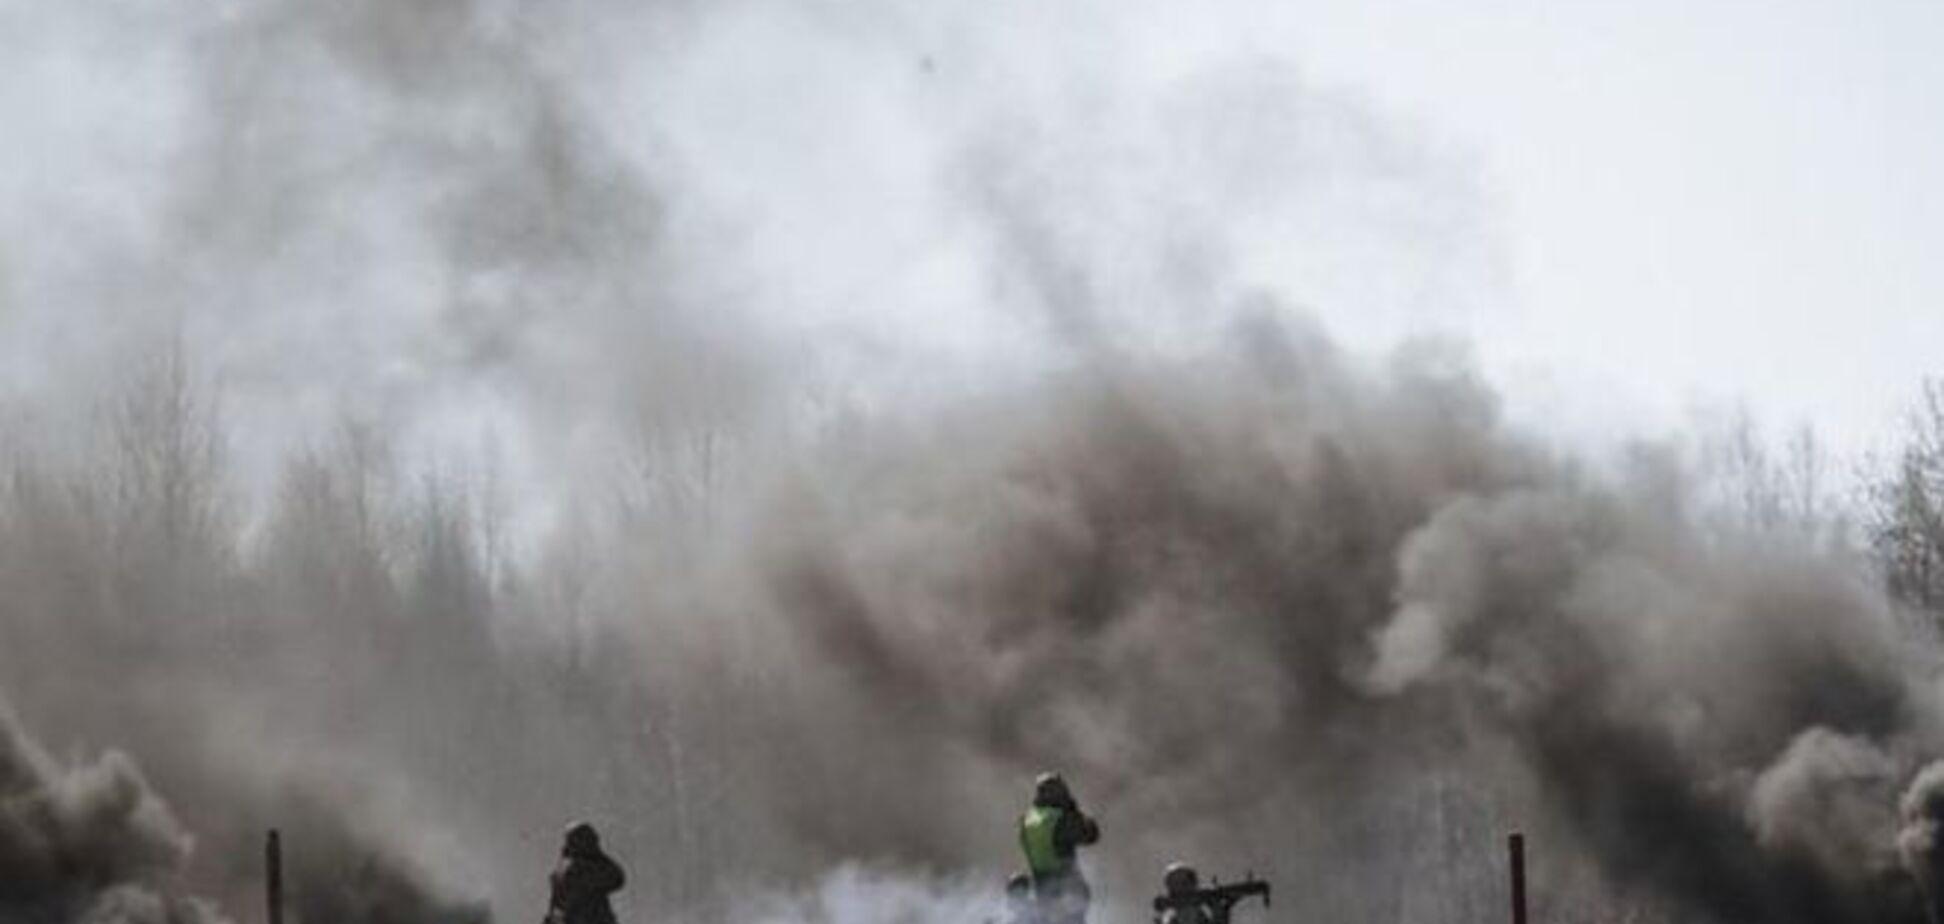 Ранен: бойцы АТО разгромили штаб террориста Гиви под Донецком - СМИ